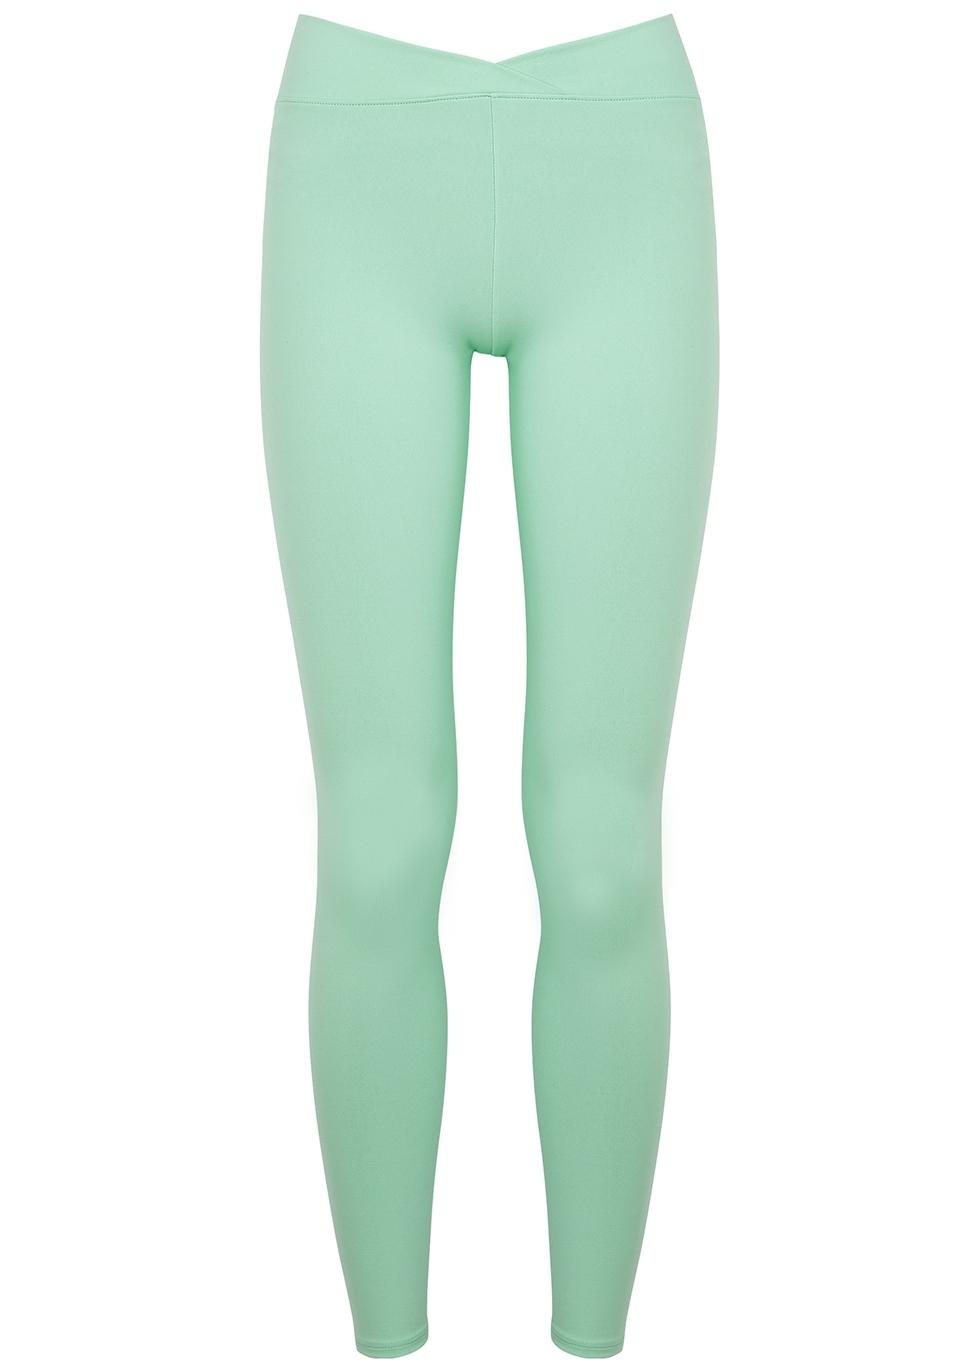 ef924bed1d8ed4 Women's Activewear Leggings and Tights - Harvey Nichols